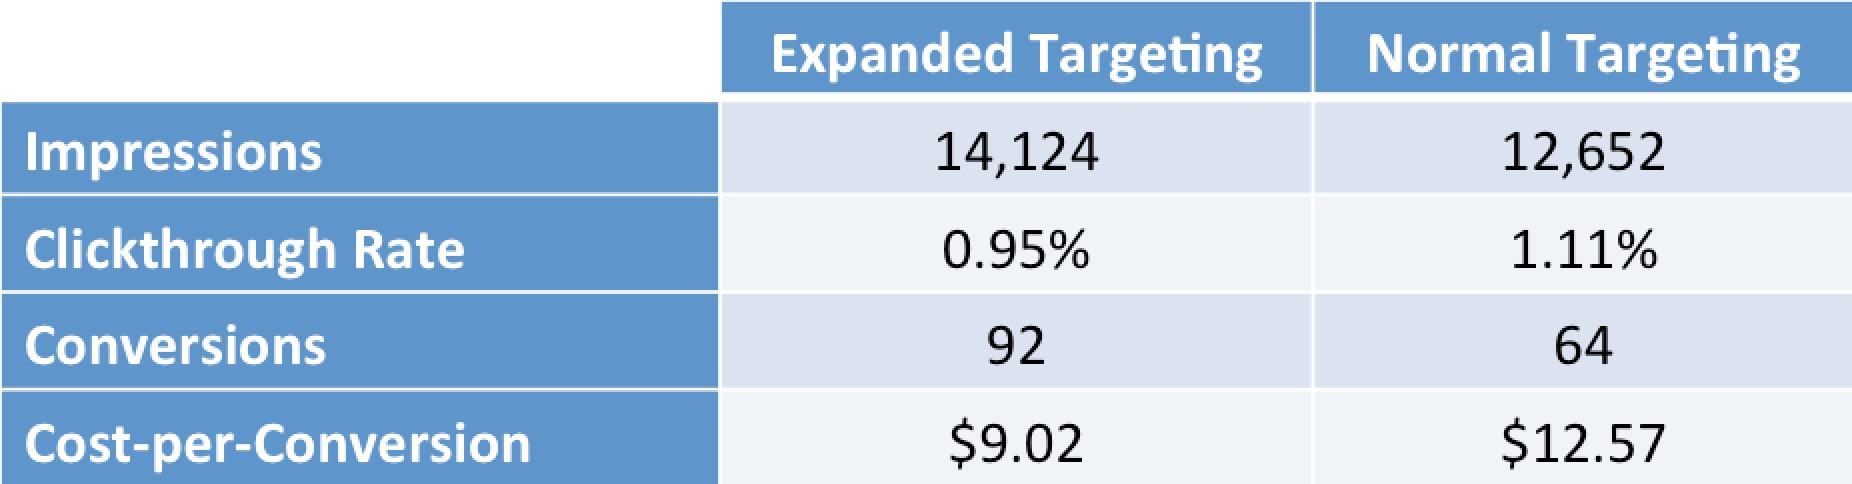 Facebook Targeting Expansion – Test Results | Disruptive Advertising